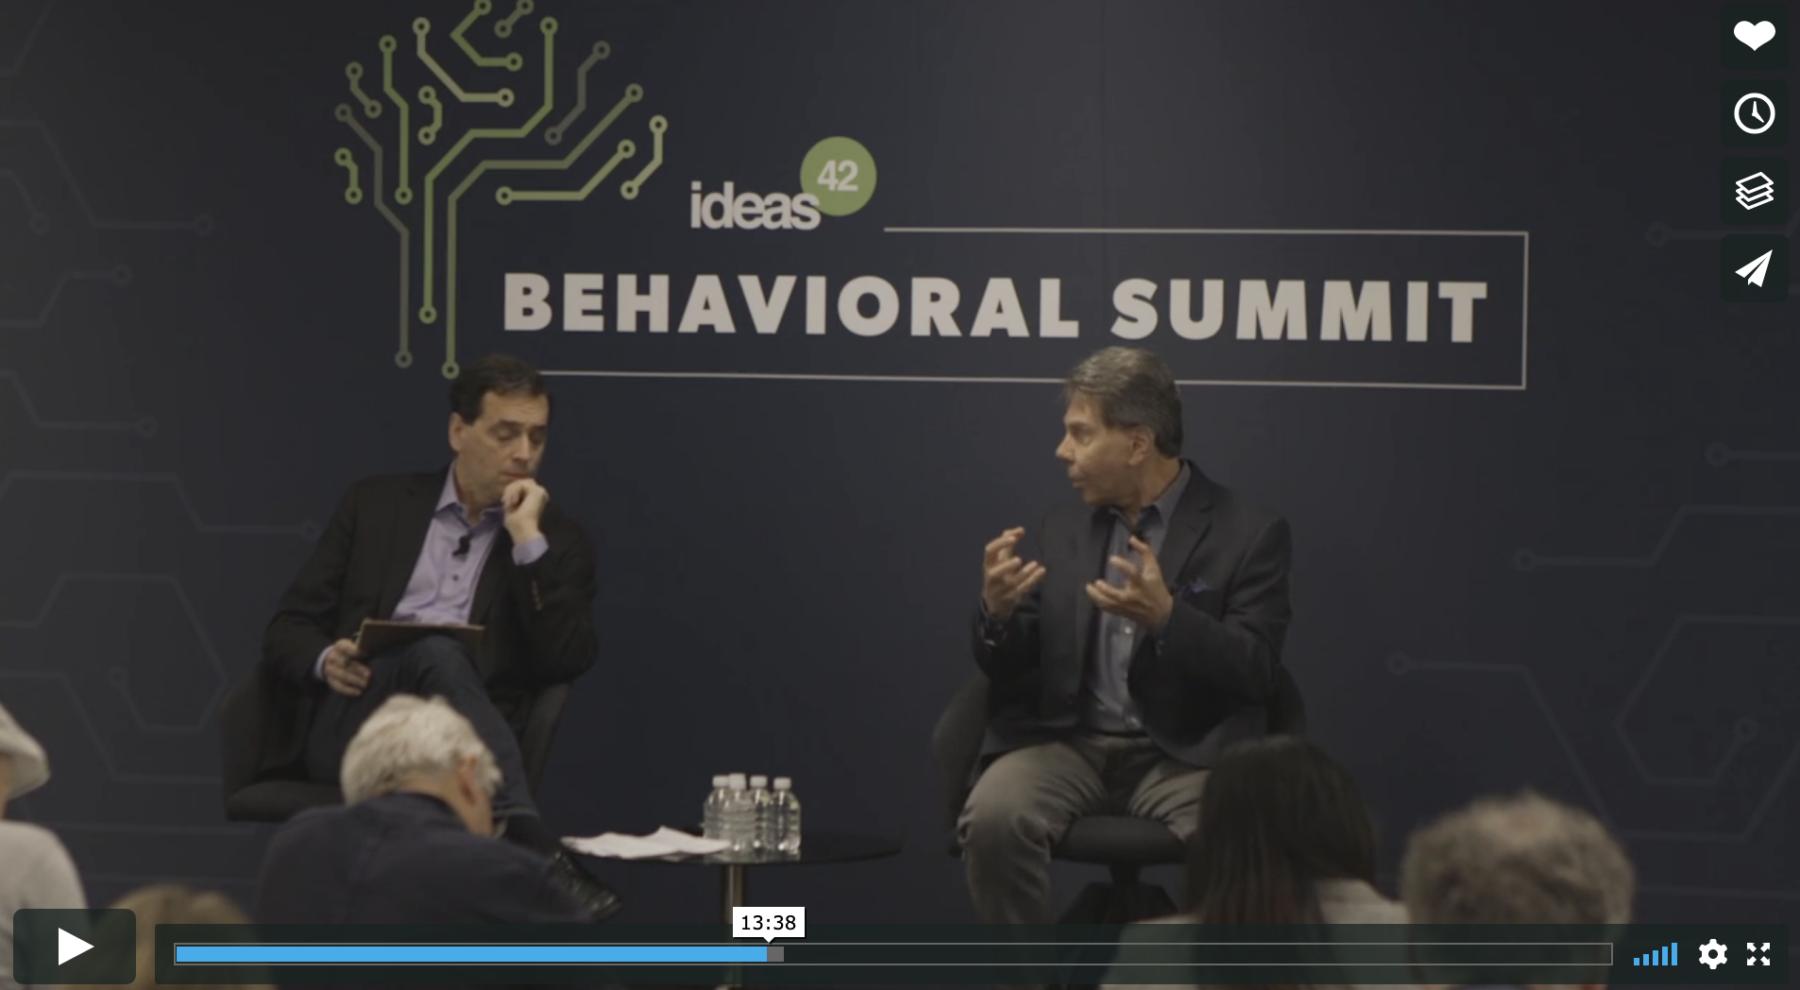 Robert Cialdini Behavioral Summit 2018